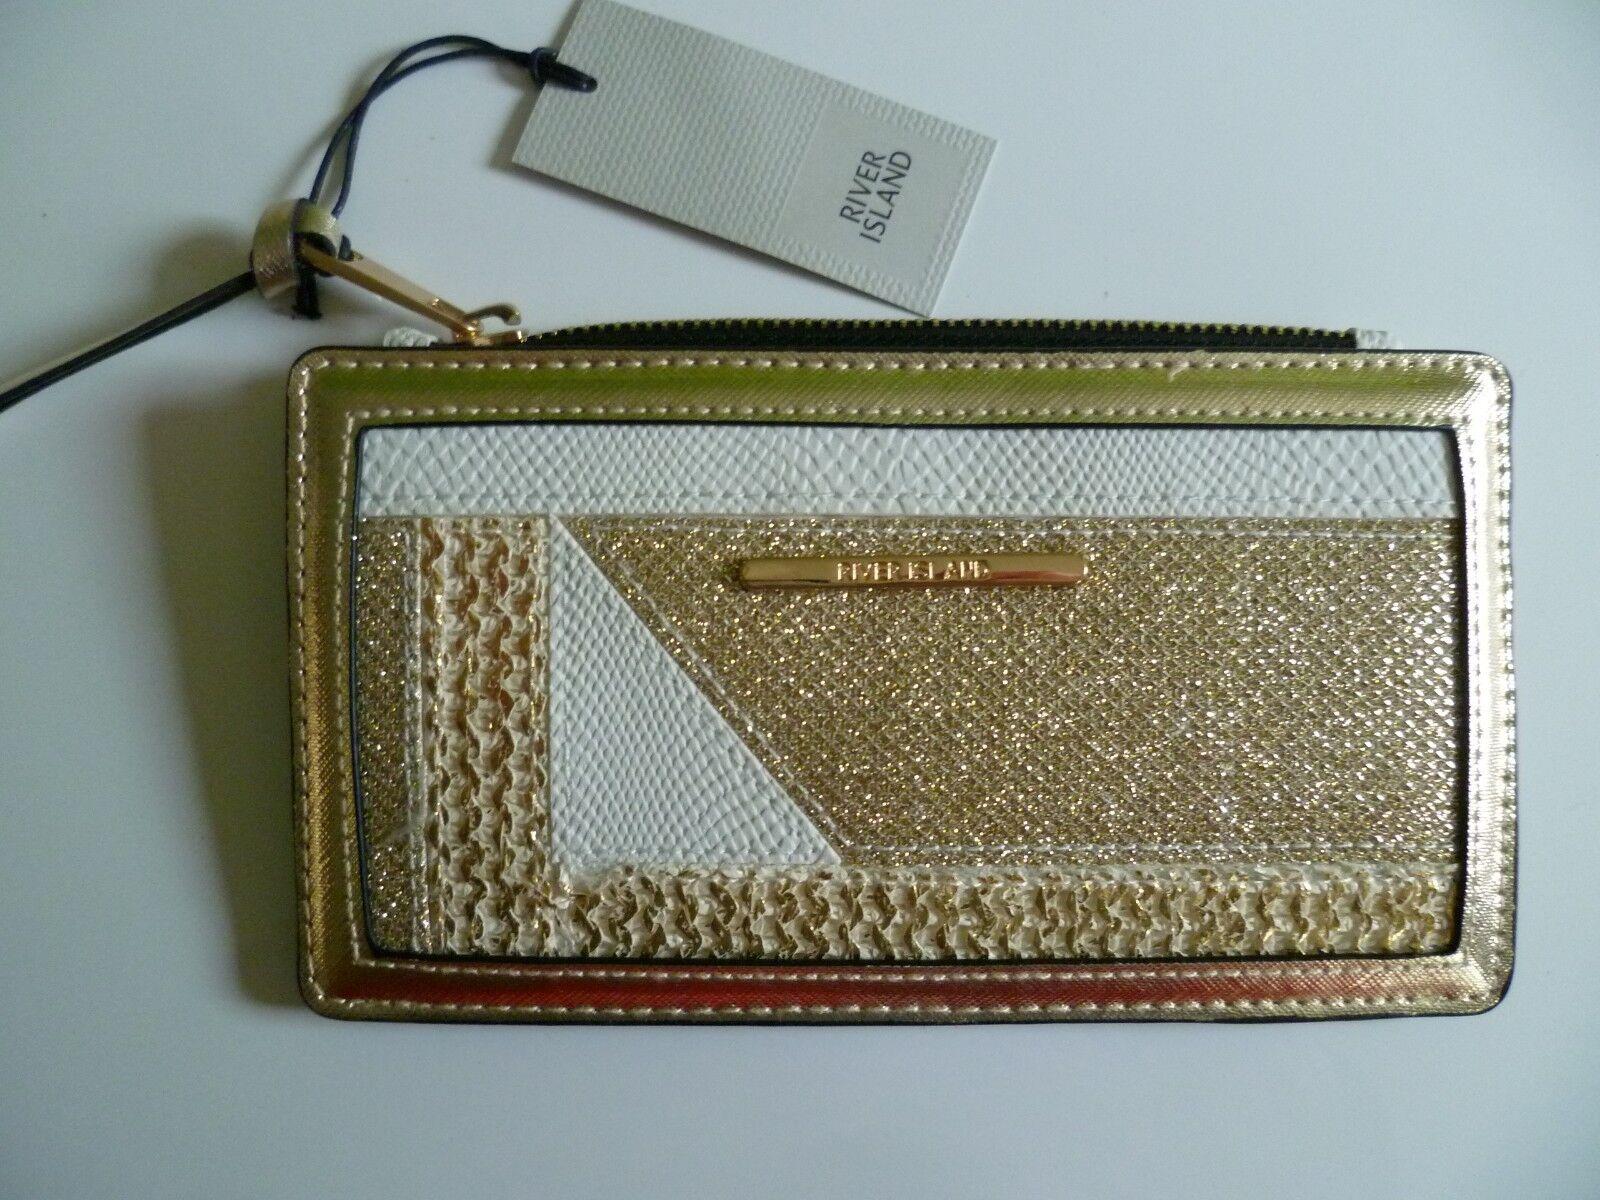 River Island Ivory Gold Clutch Bag Purse Cards Notes Lipstick etc BNWT